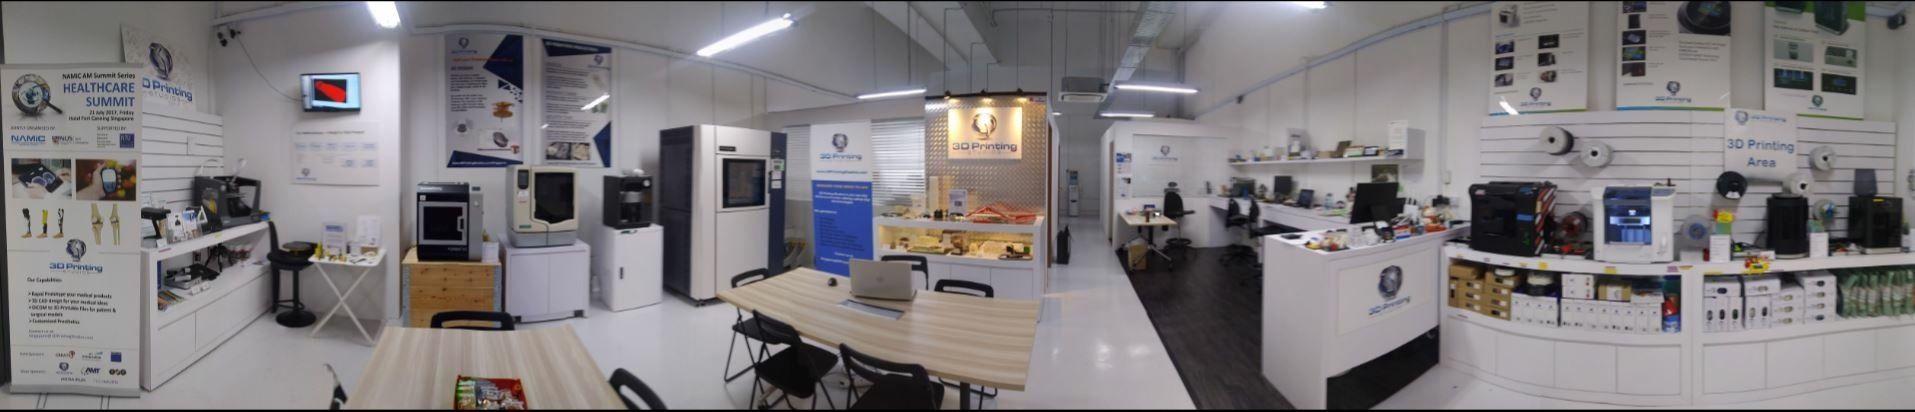 Singapore 3D Printers Meetup